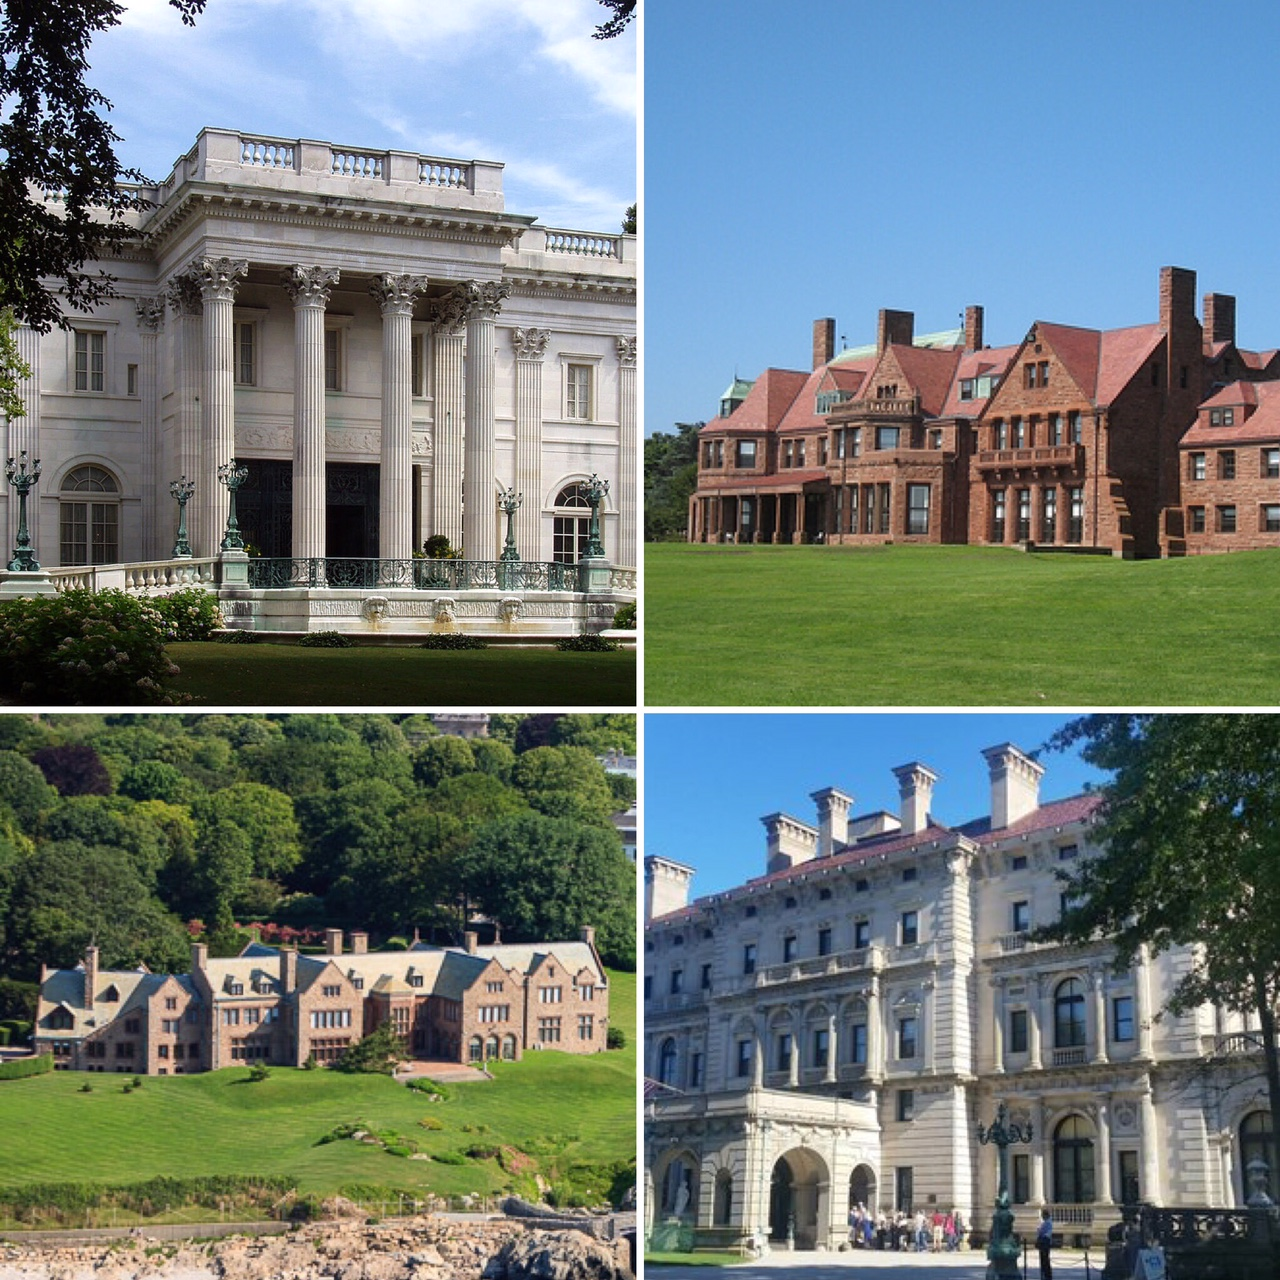 Clockwise, from Upper Left: Marble House, built by William K Vanderbilt, Vinland, home of Florence Vanderbilt Twombly, The Breakers, Rough Point, built for Frederick Vanderbilt